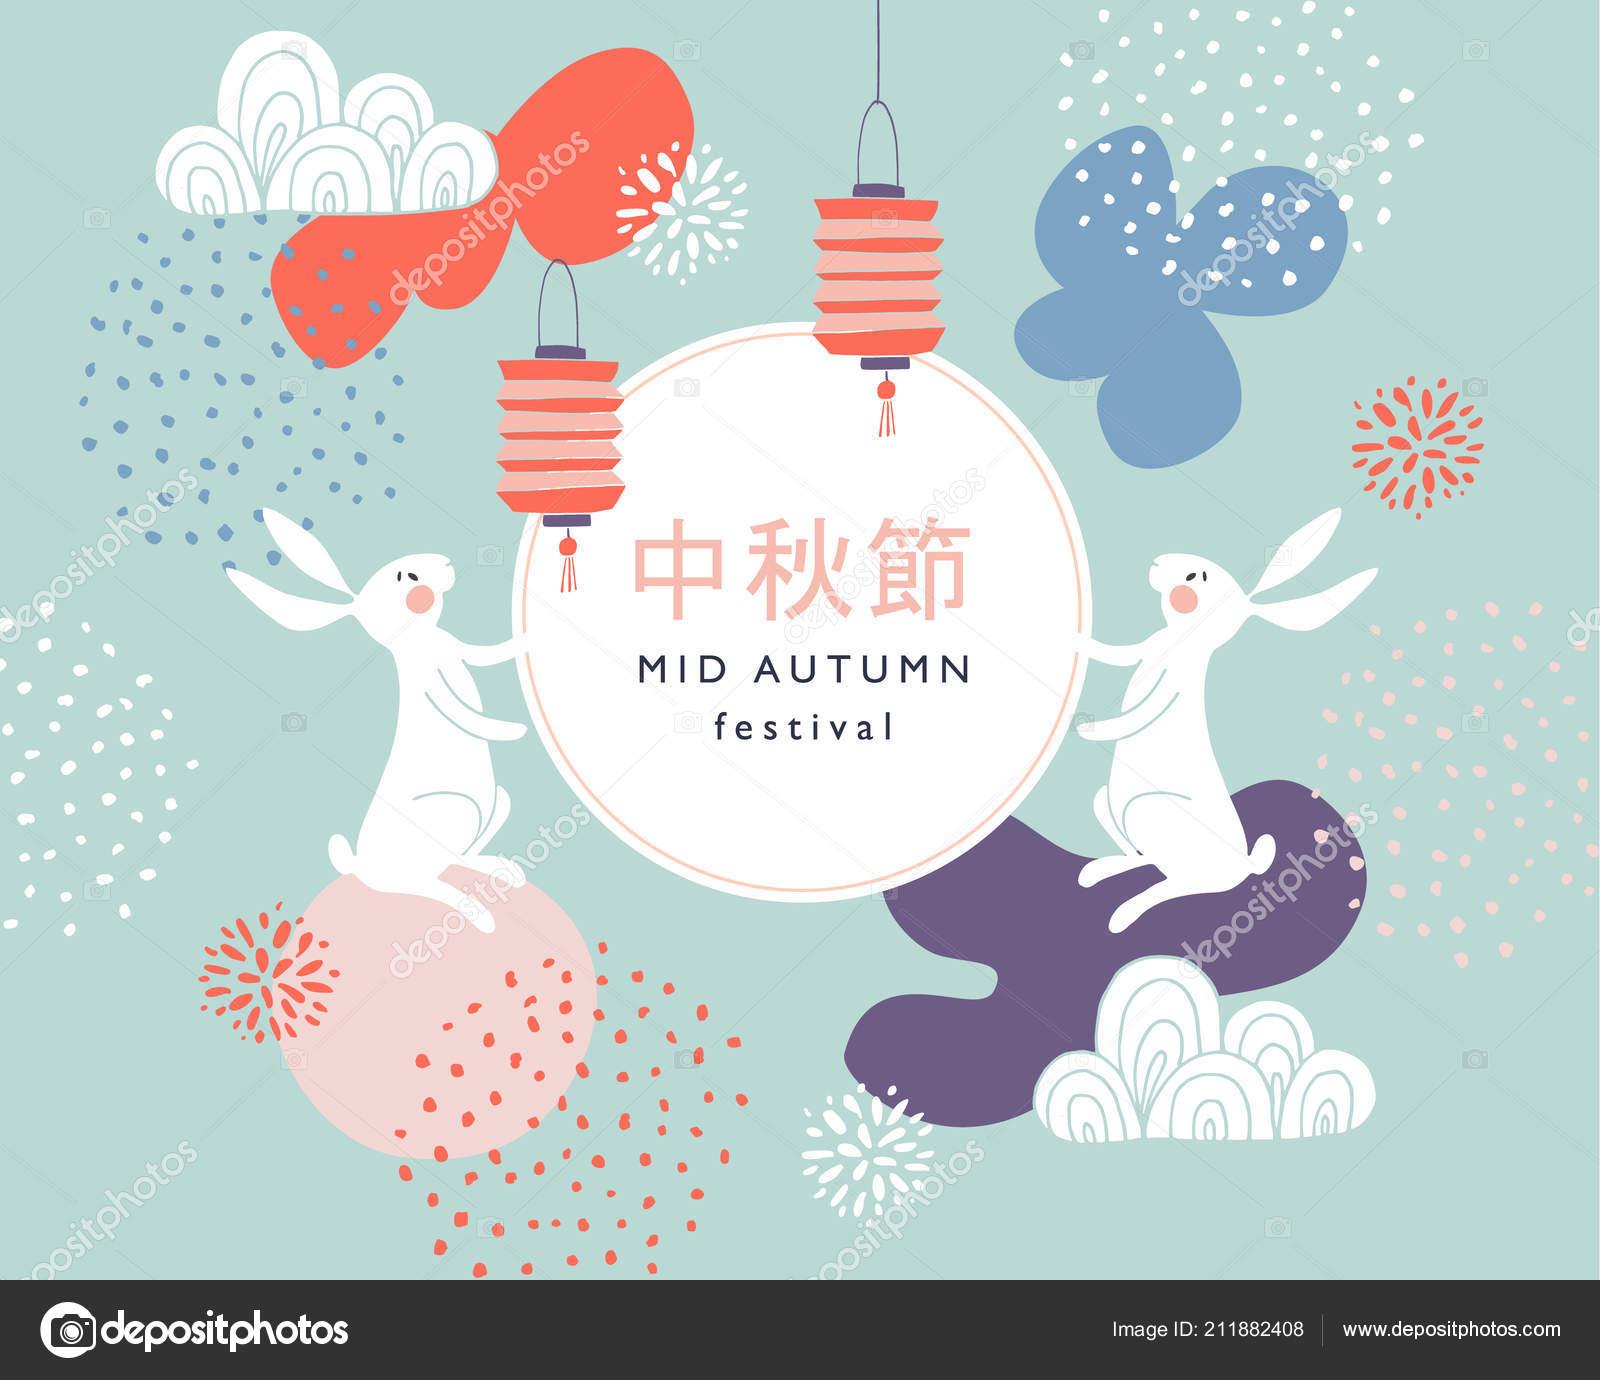 Mid autumn festival greeting card invitation with jade rabbits mid autumn festival greeting card invitation with jade rabbits moon silhouette chrysanthemum flowers m4hsunfo